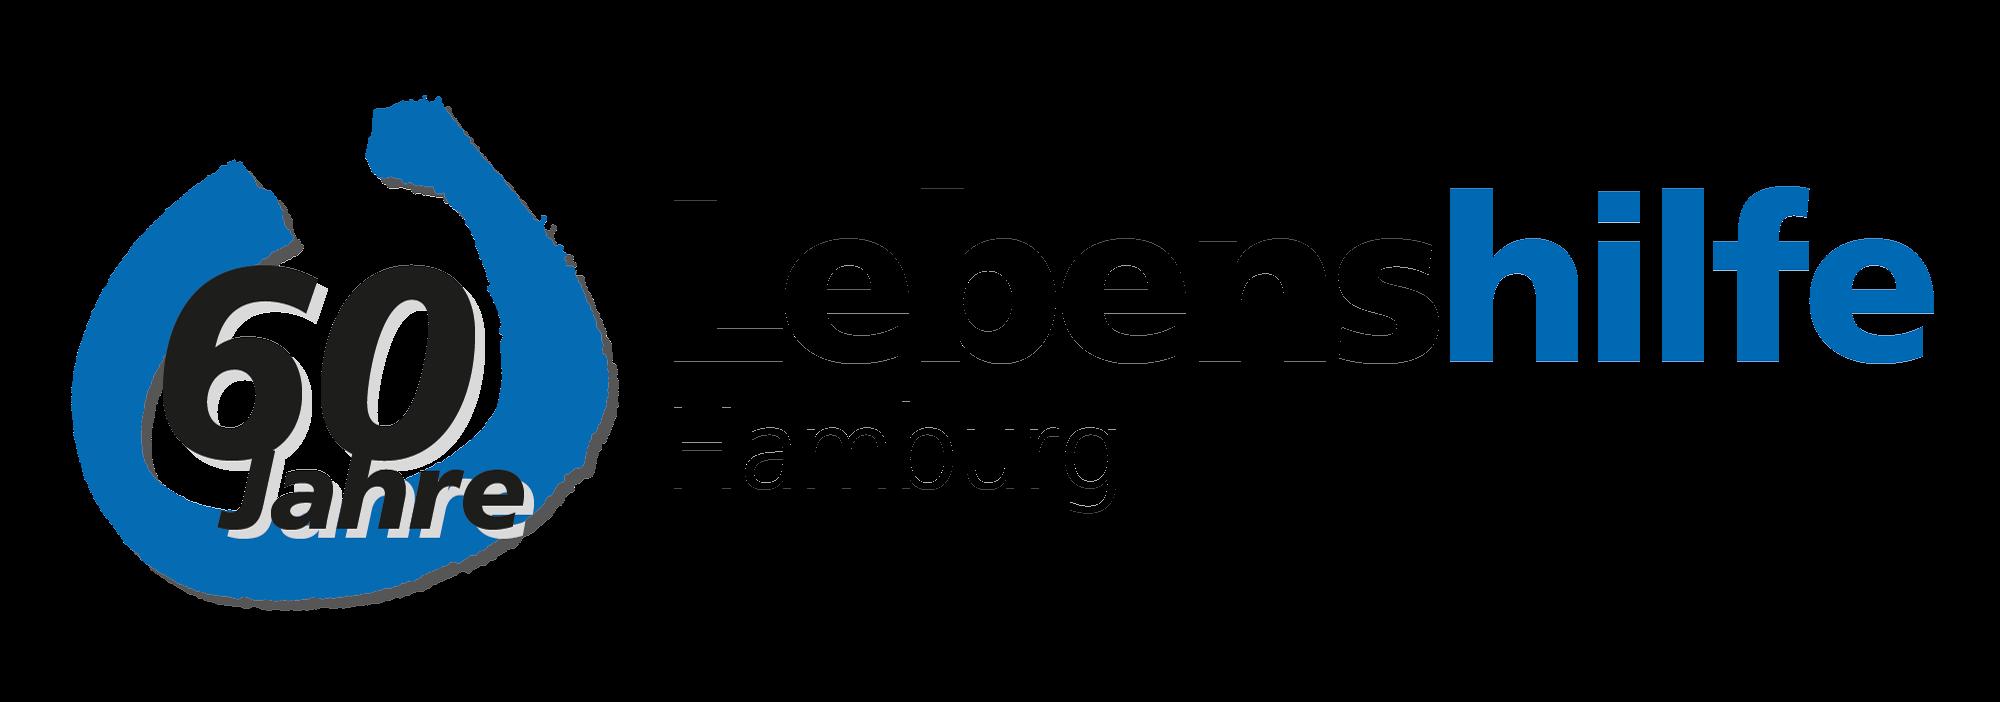 Logo 60 Jahre Lebenshilfe Hamburg